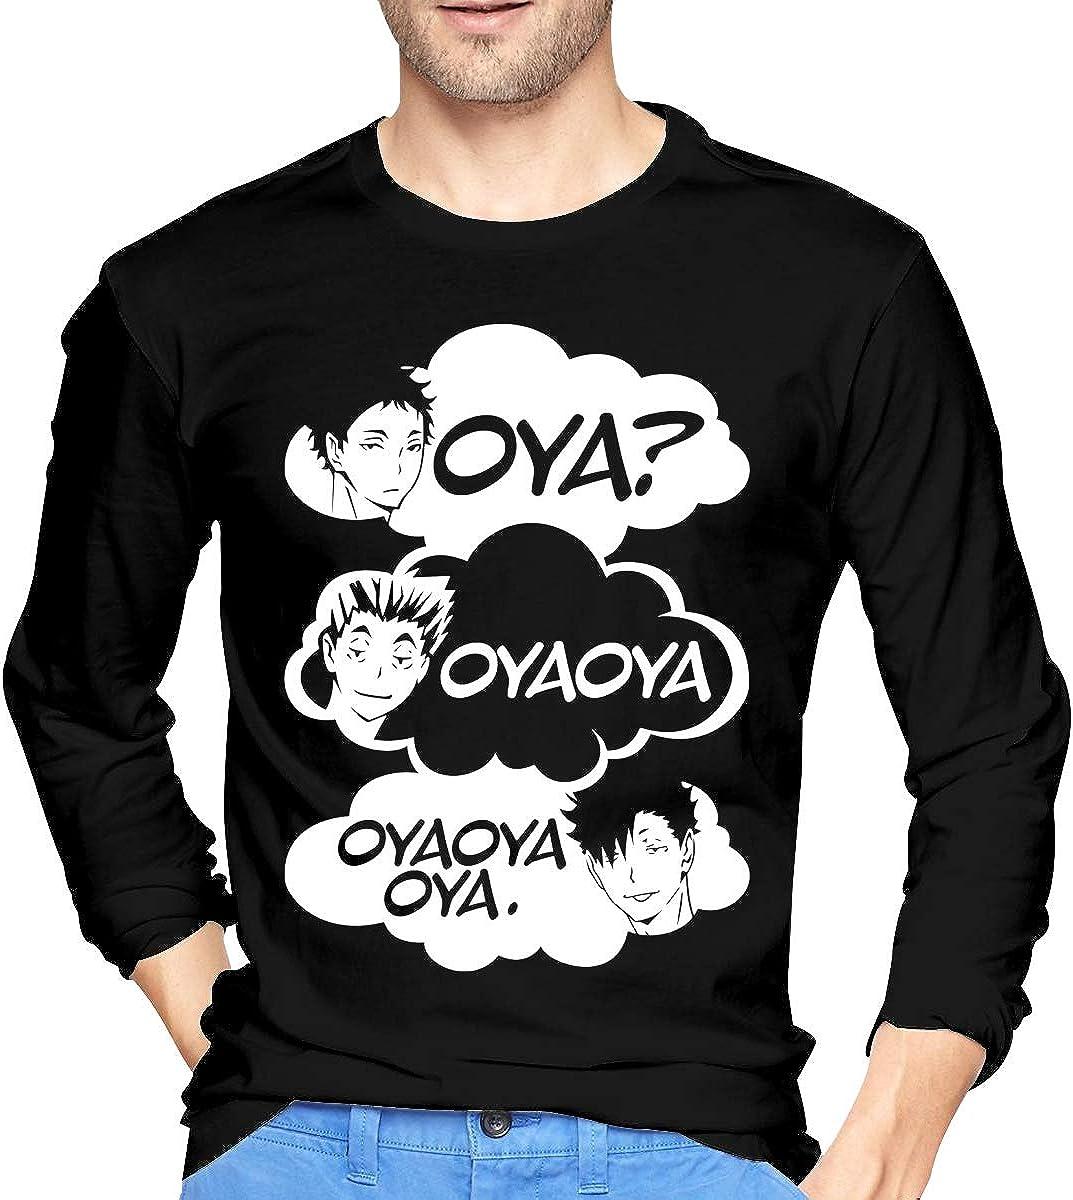 De.Pommeyeux OYA OYA OYA Haikyuu T-shirt estiva giapponese Anime cotone Top Harajuku Casual Top